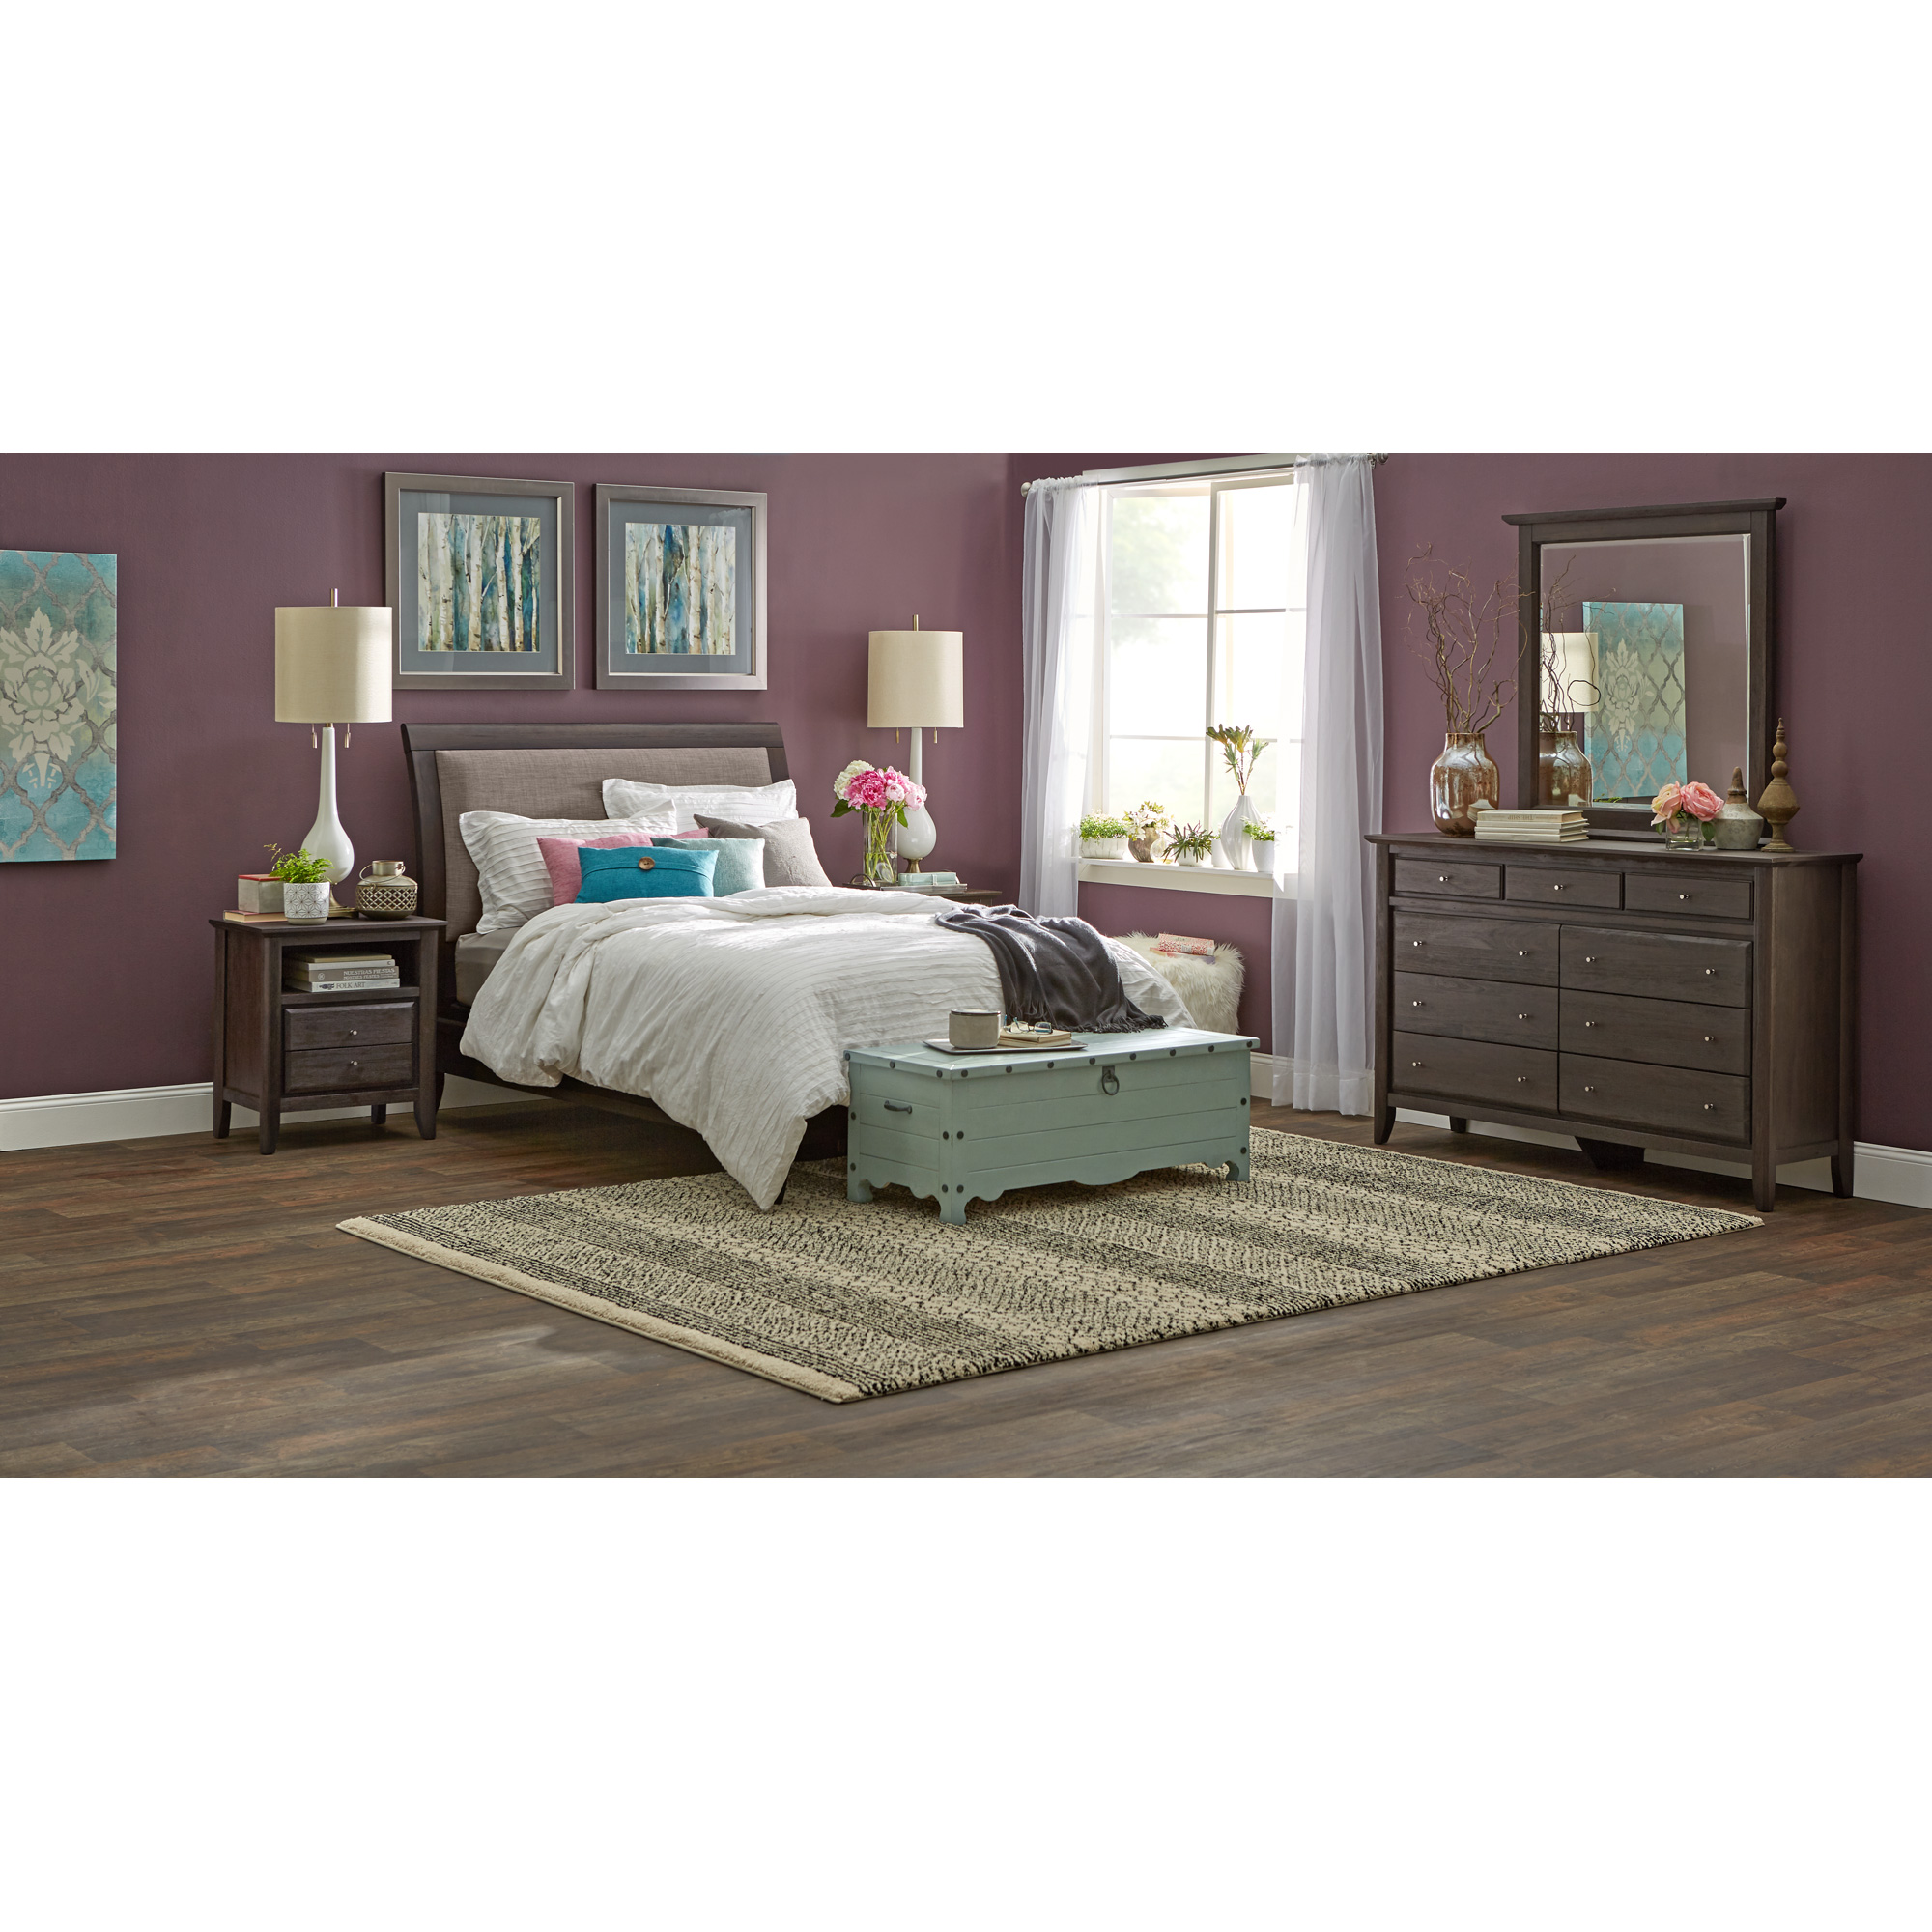 Modus Furniture International | City II Basalt King 4 Piece Room Group Bedroom Set